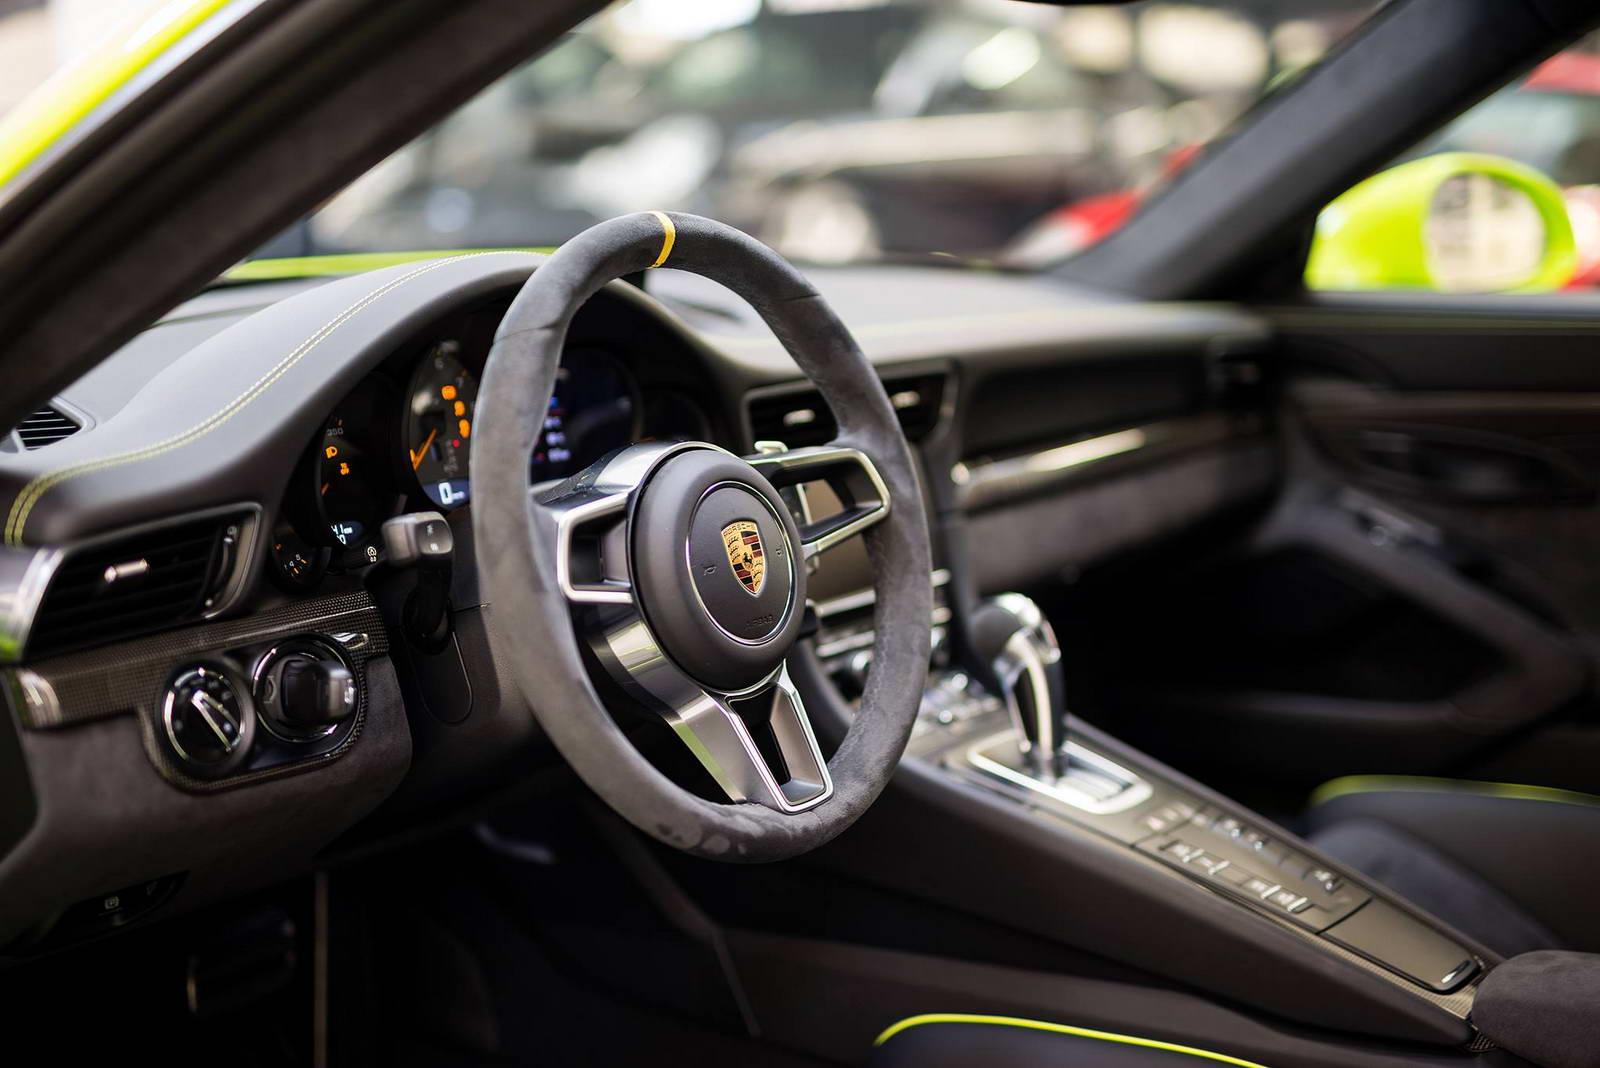 Fourtitude com - Porsche Exclusive shows off a unique Birch